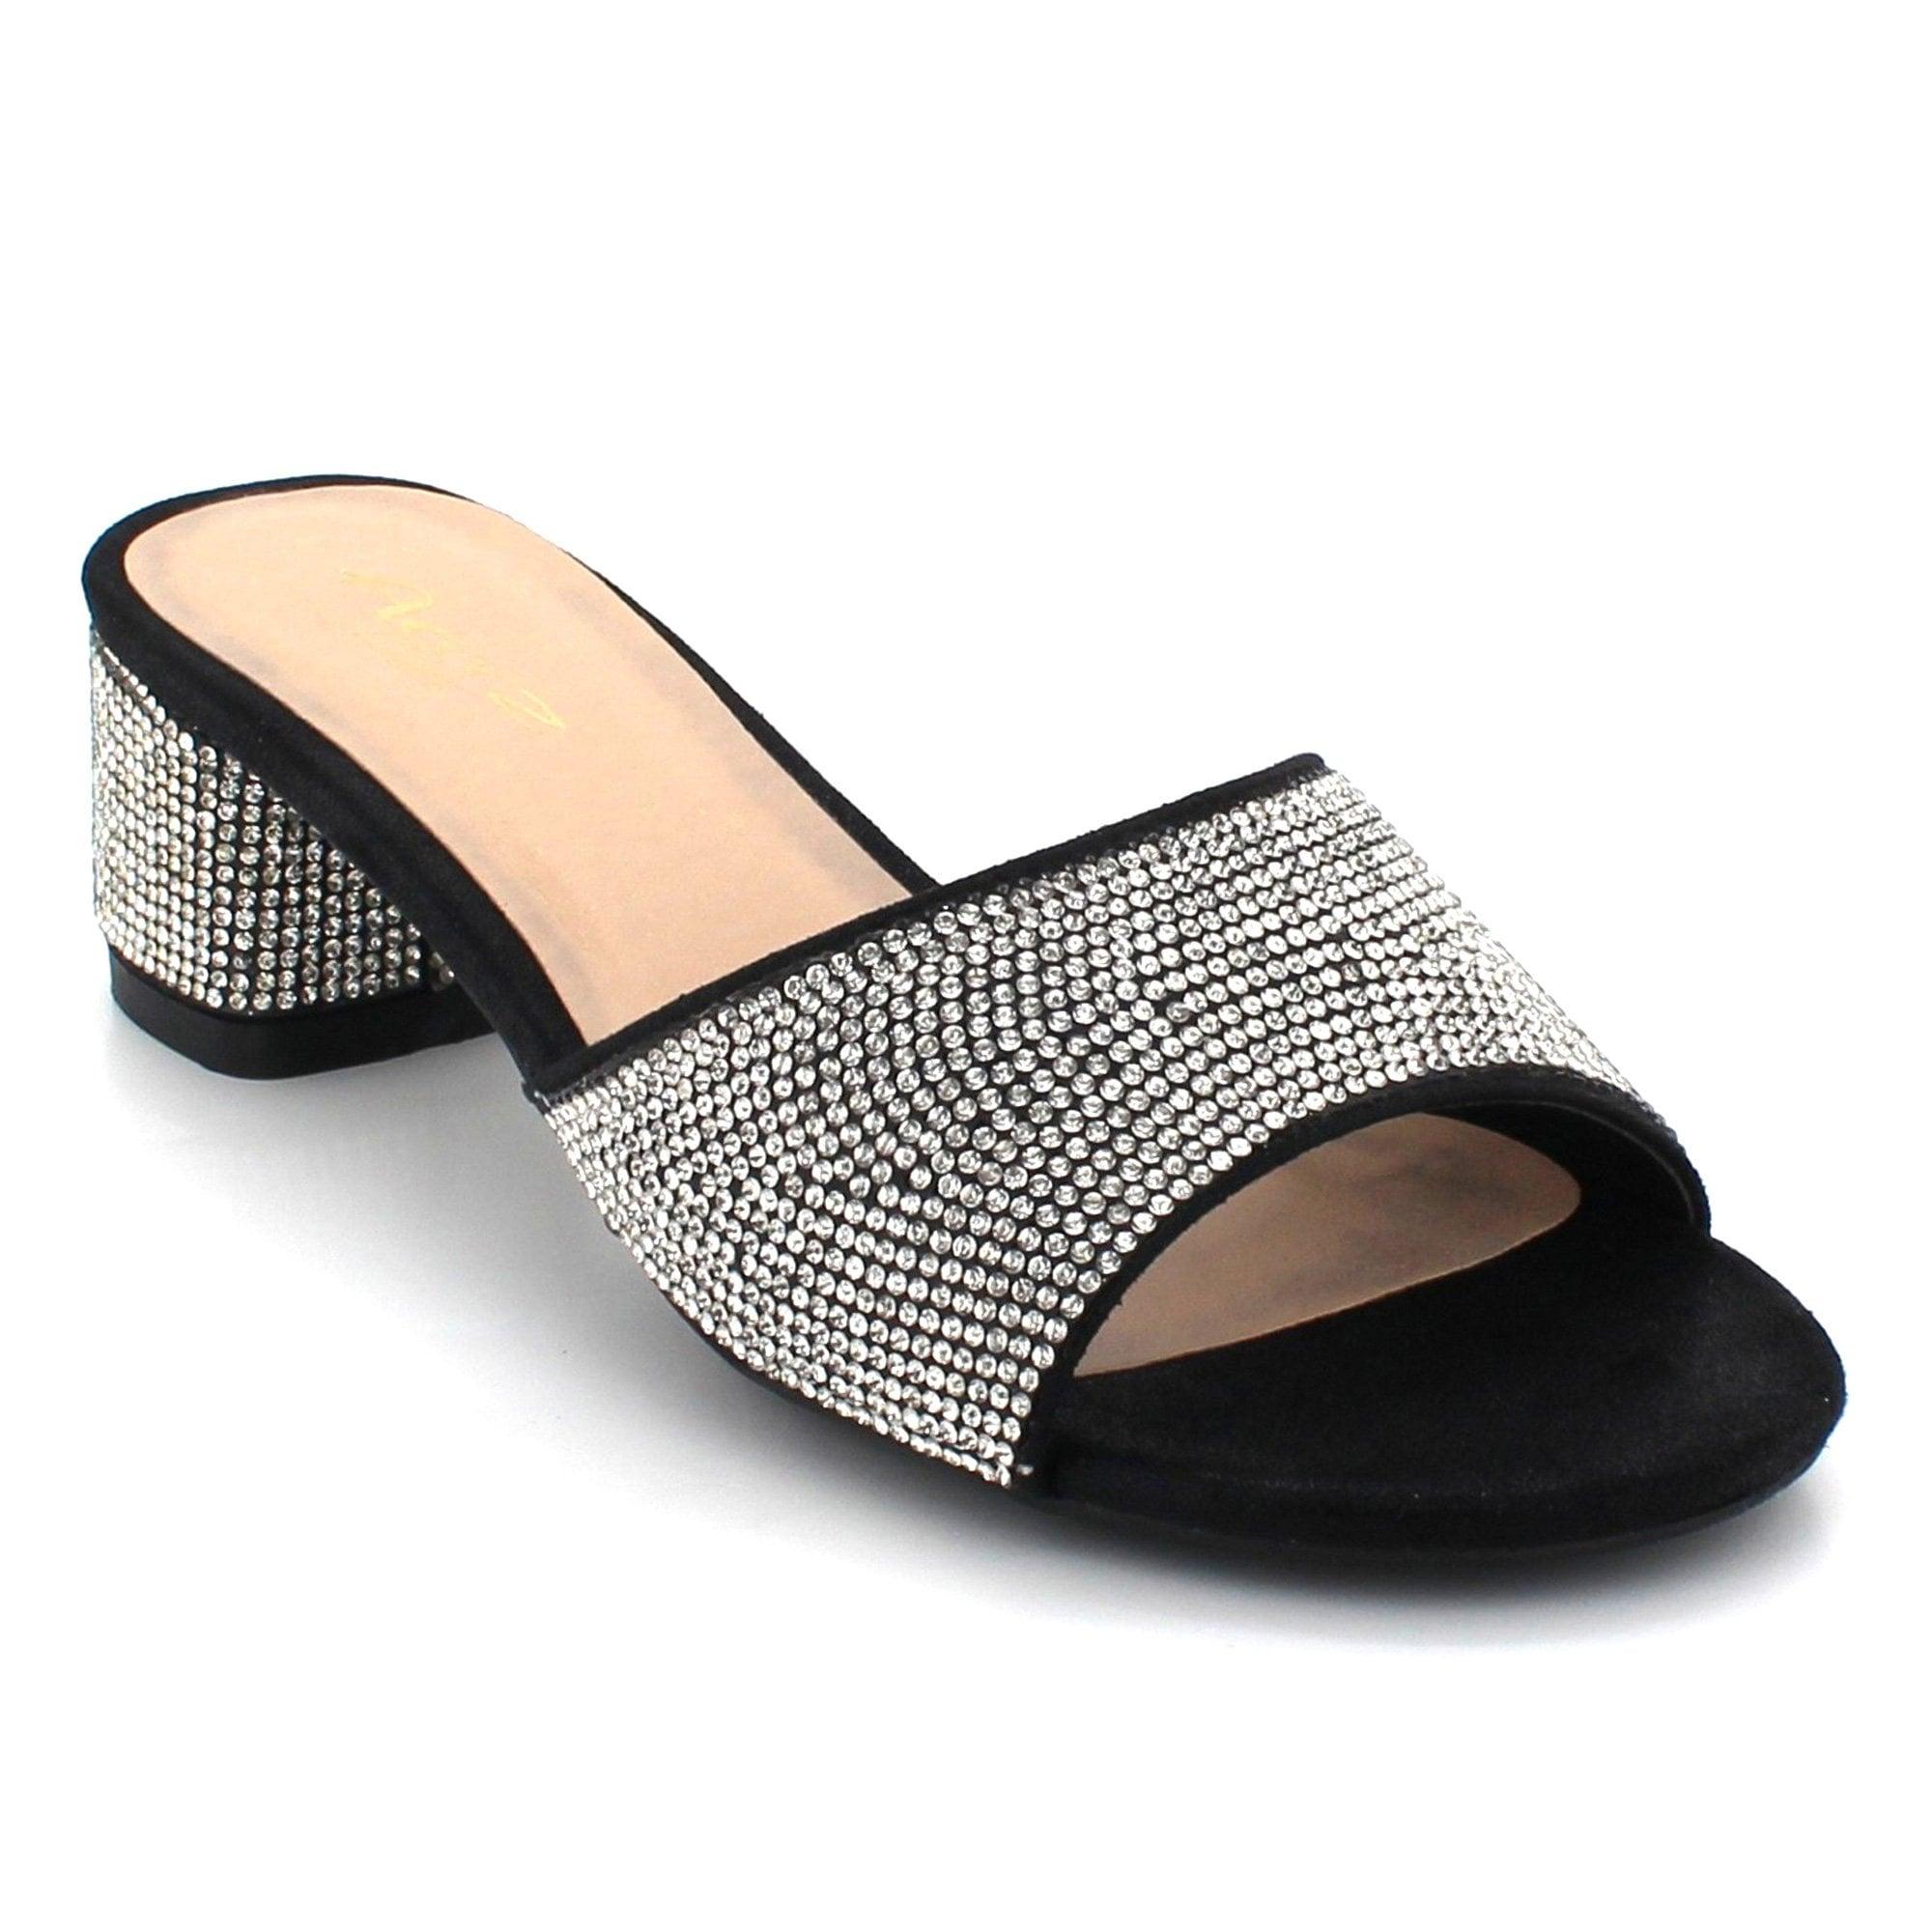 31a28cd9f4 Aarz London Lettice- Crystal Block-heel Sandal